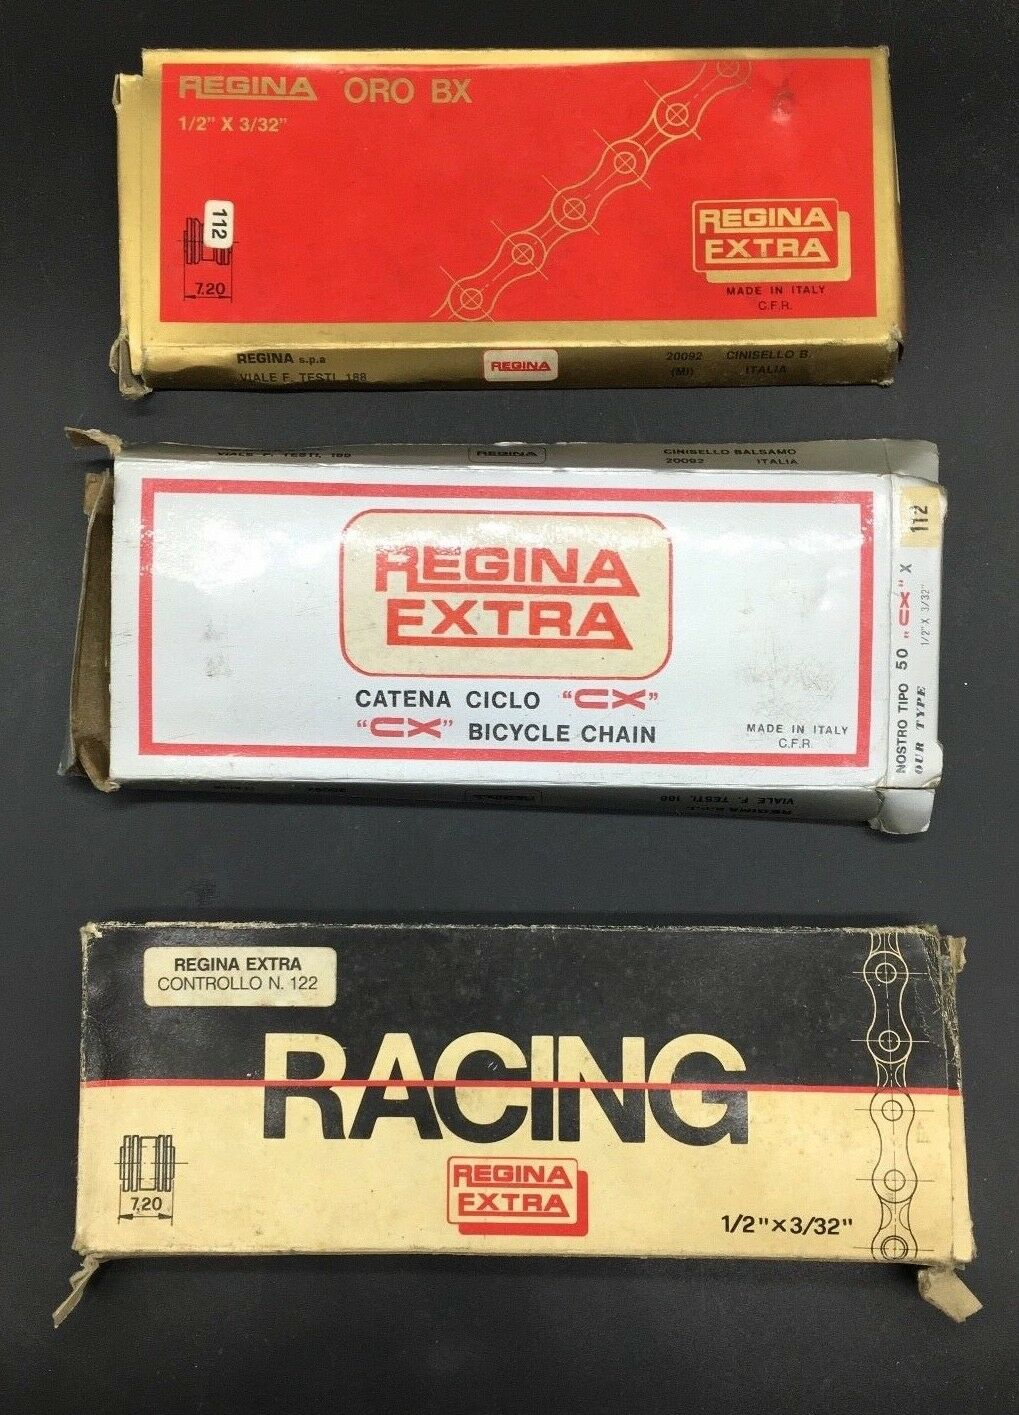 VINTAGE REGINA EXTRA CHAIN gold BX - RACING - CX  1 2 x3 32  NIB CATENA  no hesitation!buy now!